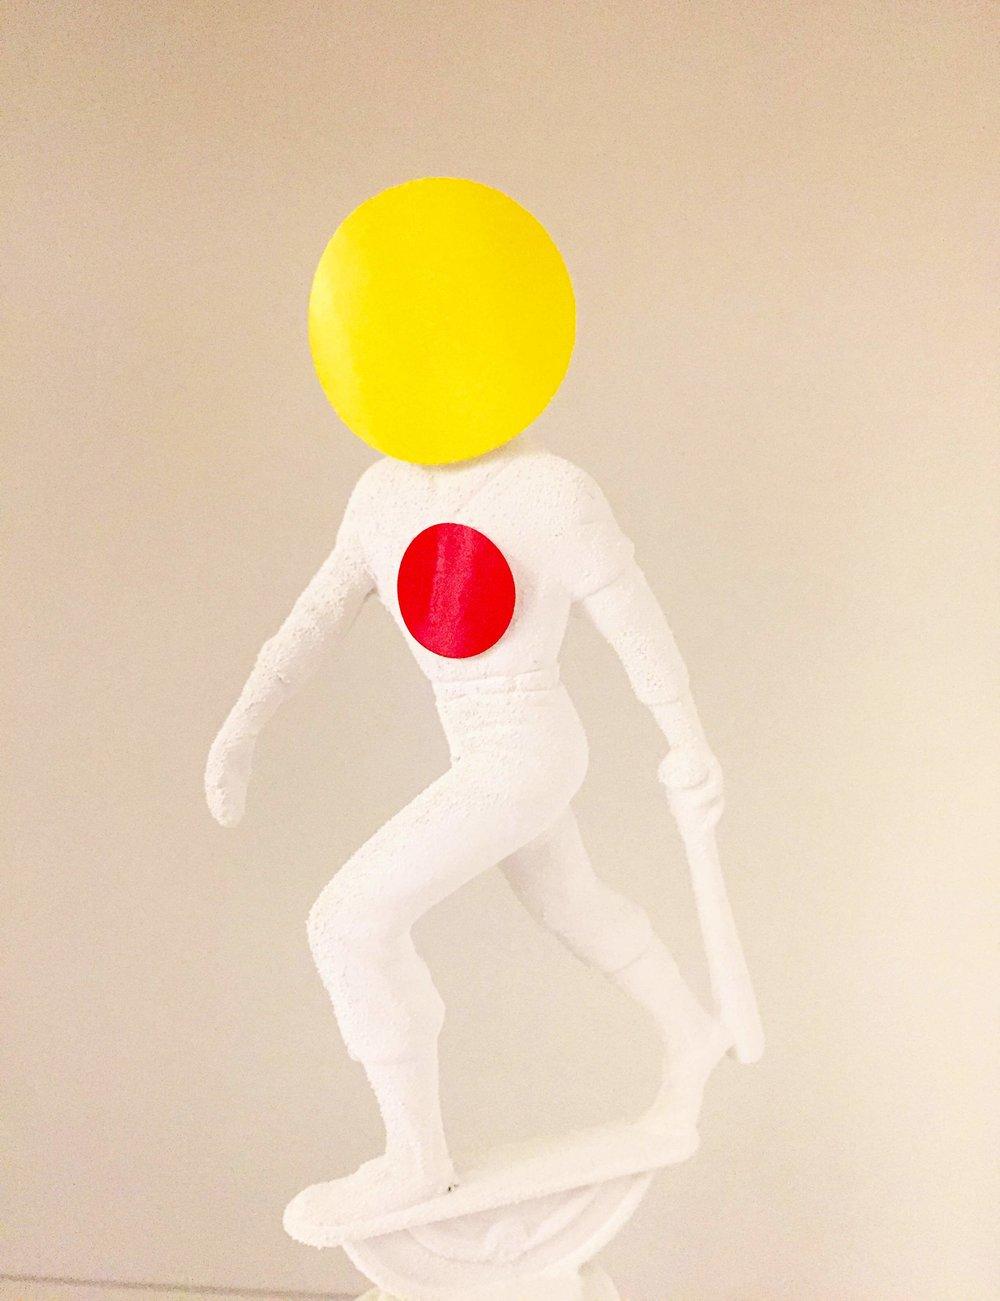 Yayoi-Kusama-Infinity-Mirror-Rooms-Hirshhorn-0014.jpg